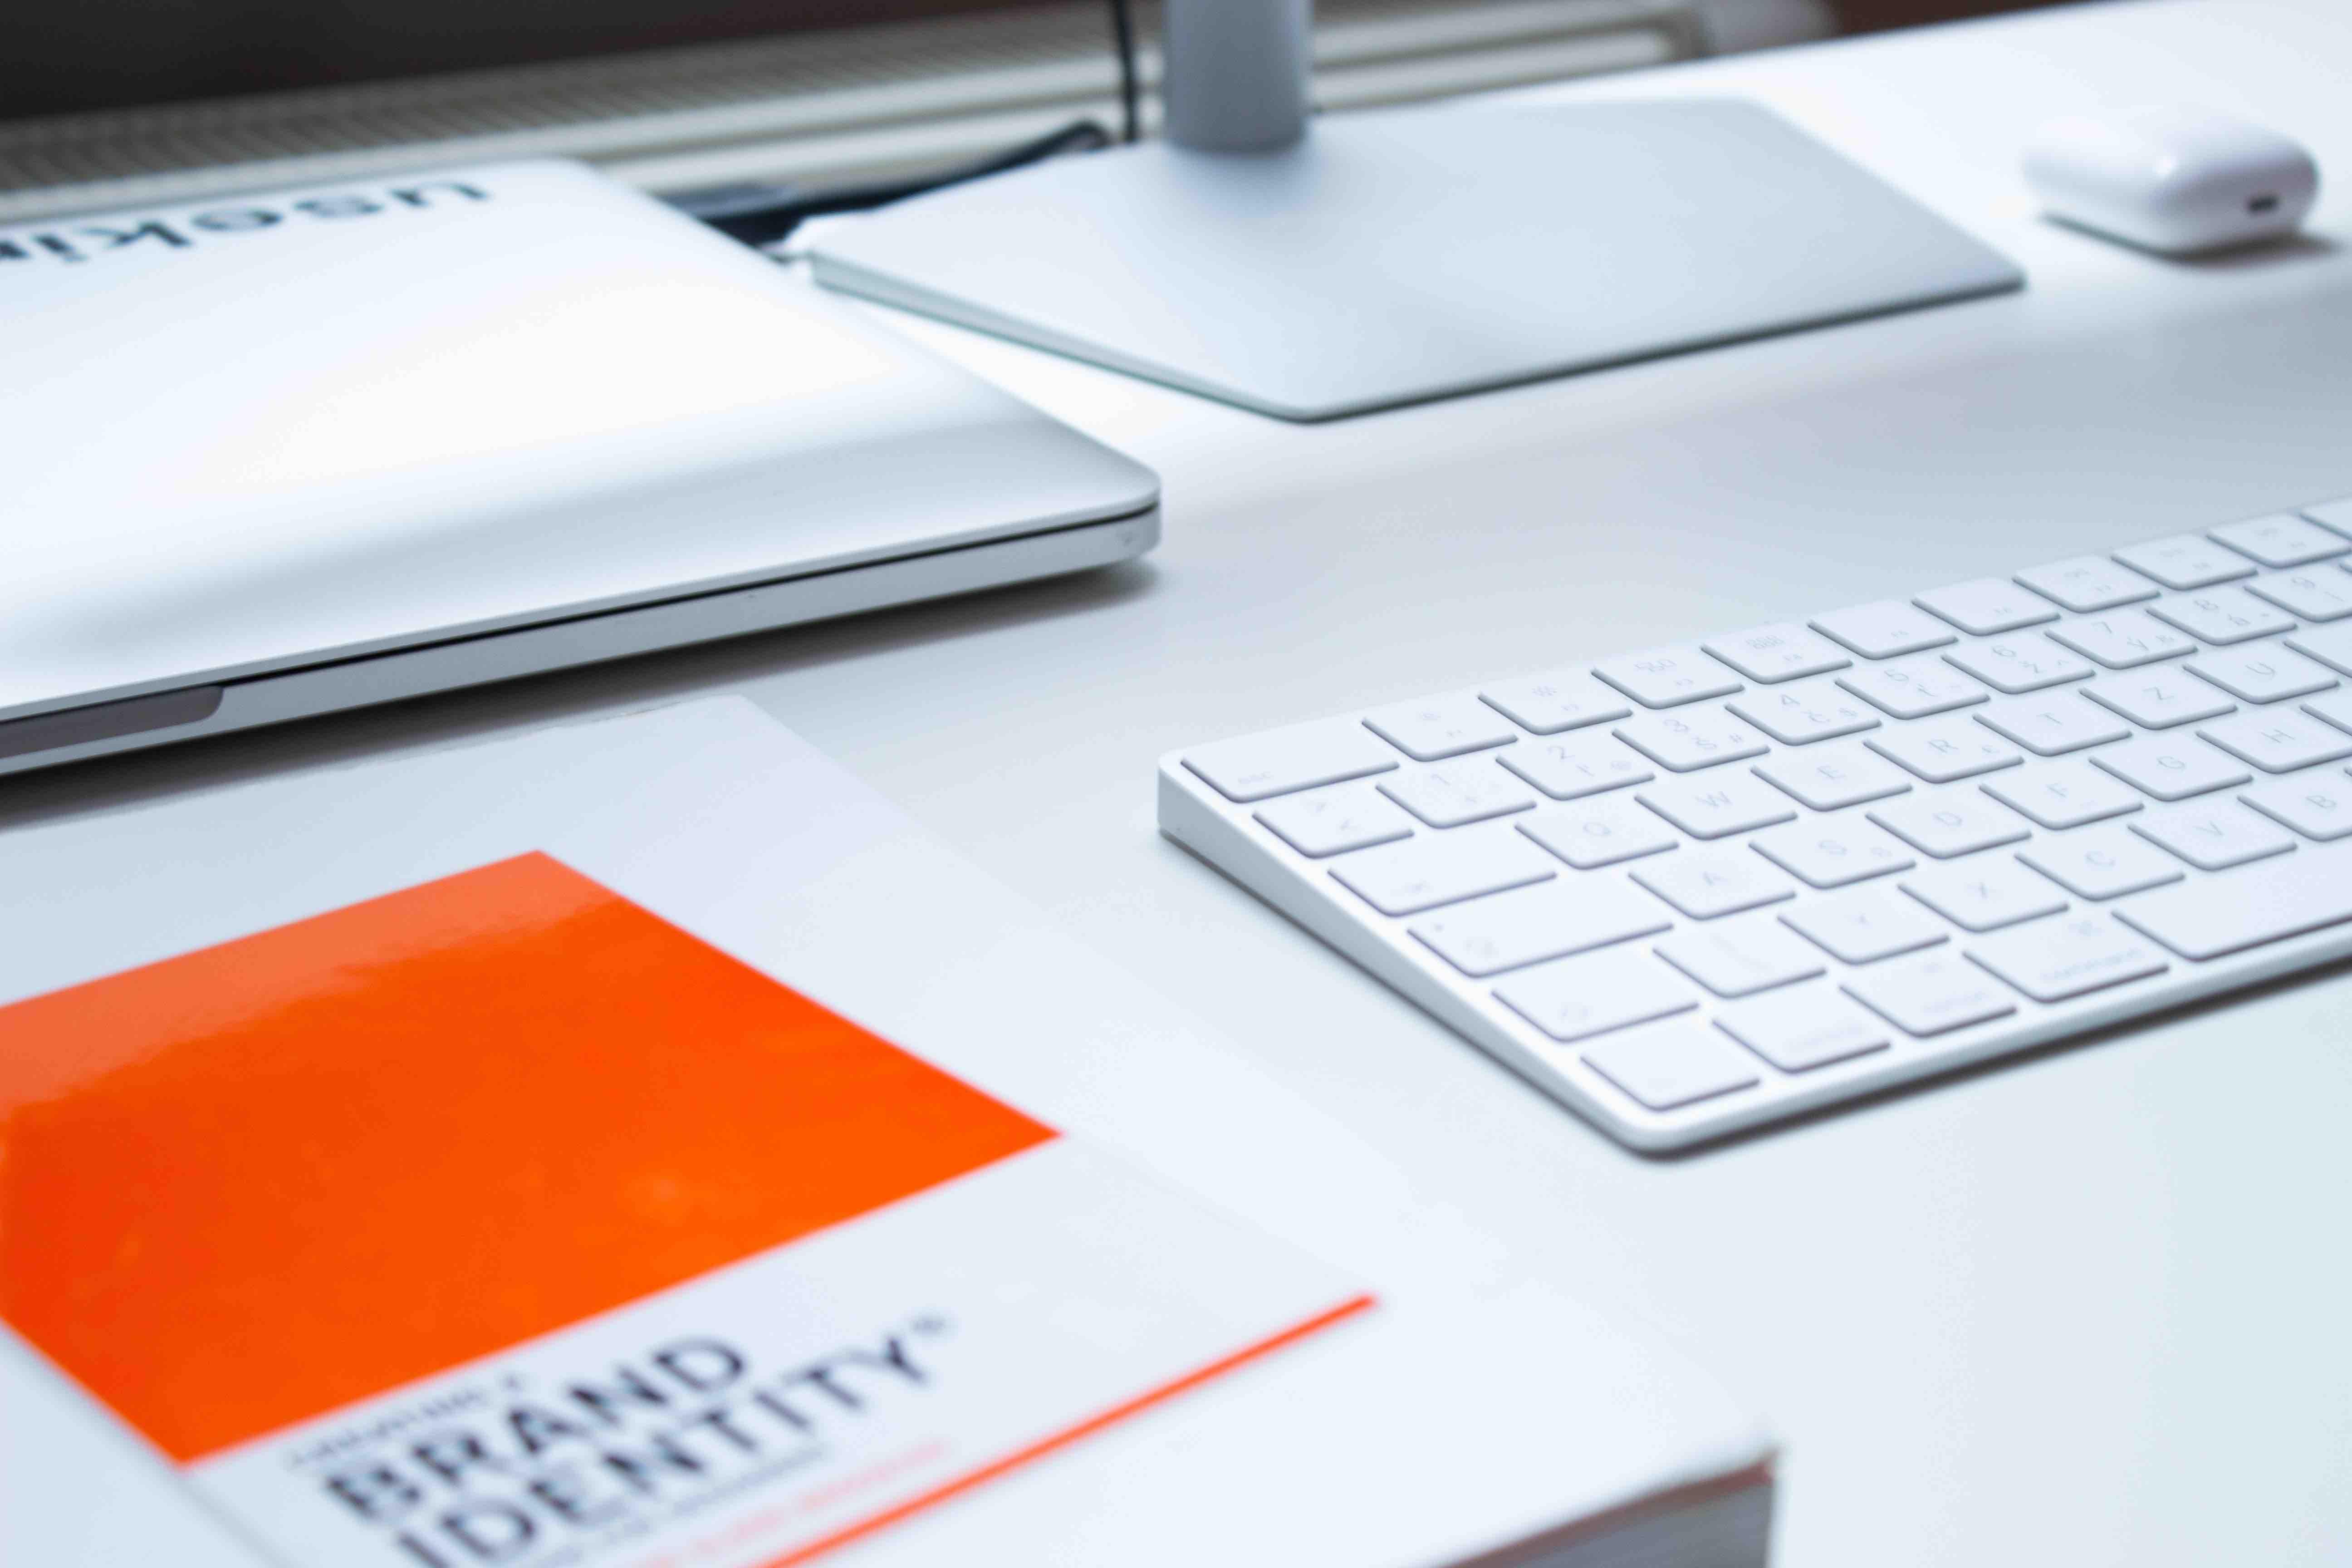 Branding manual on a desk